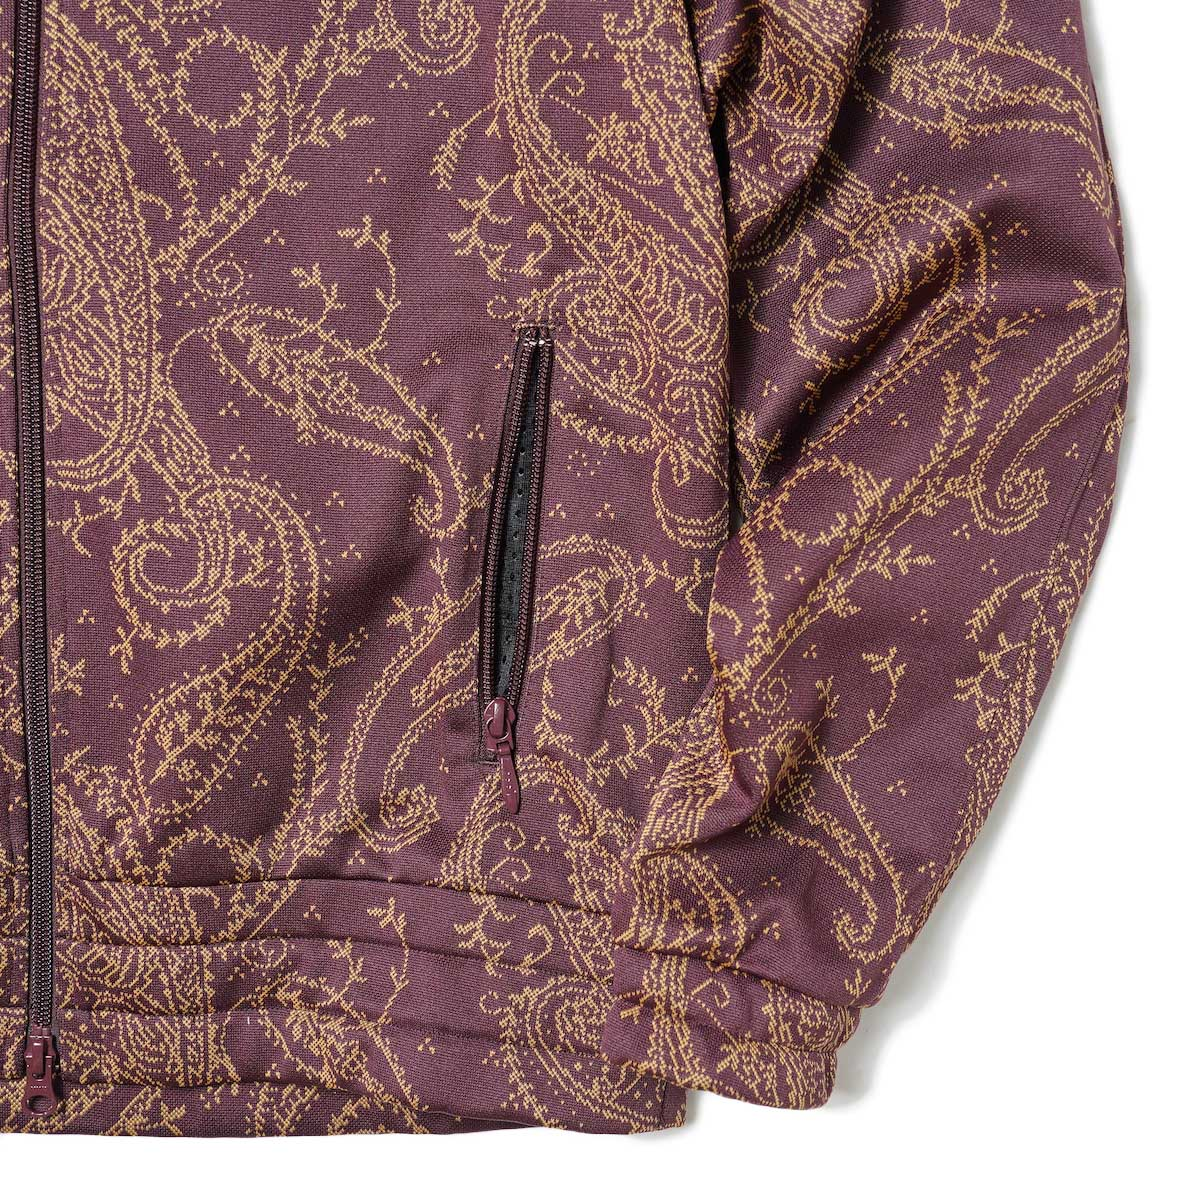 Needles / TRACK JACKET - POLY JQ (Paisley) 袖・裾